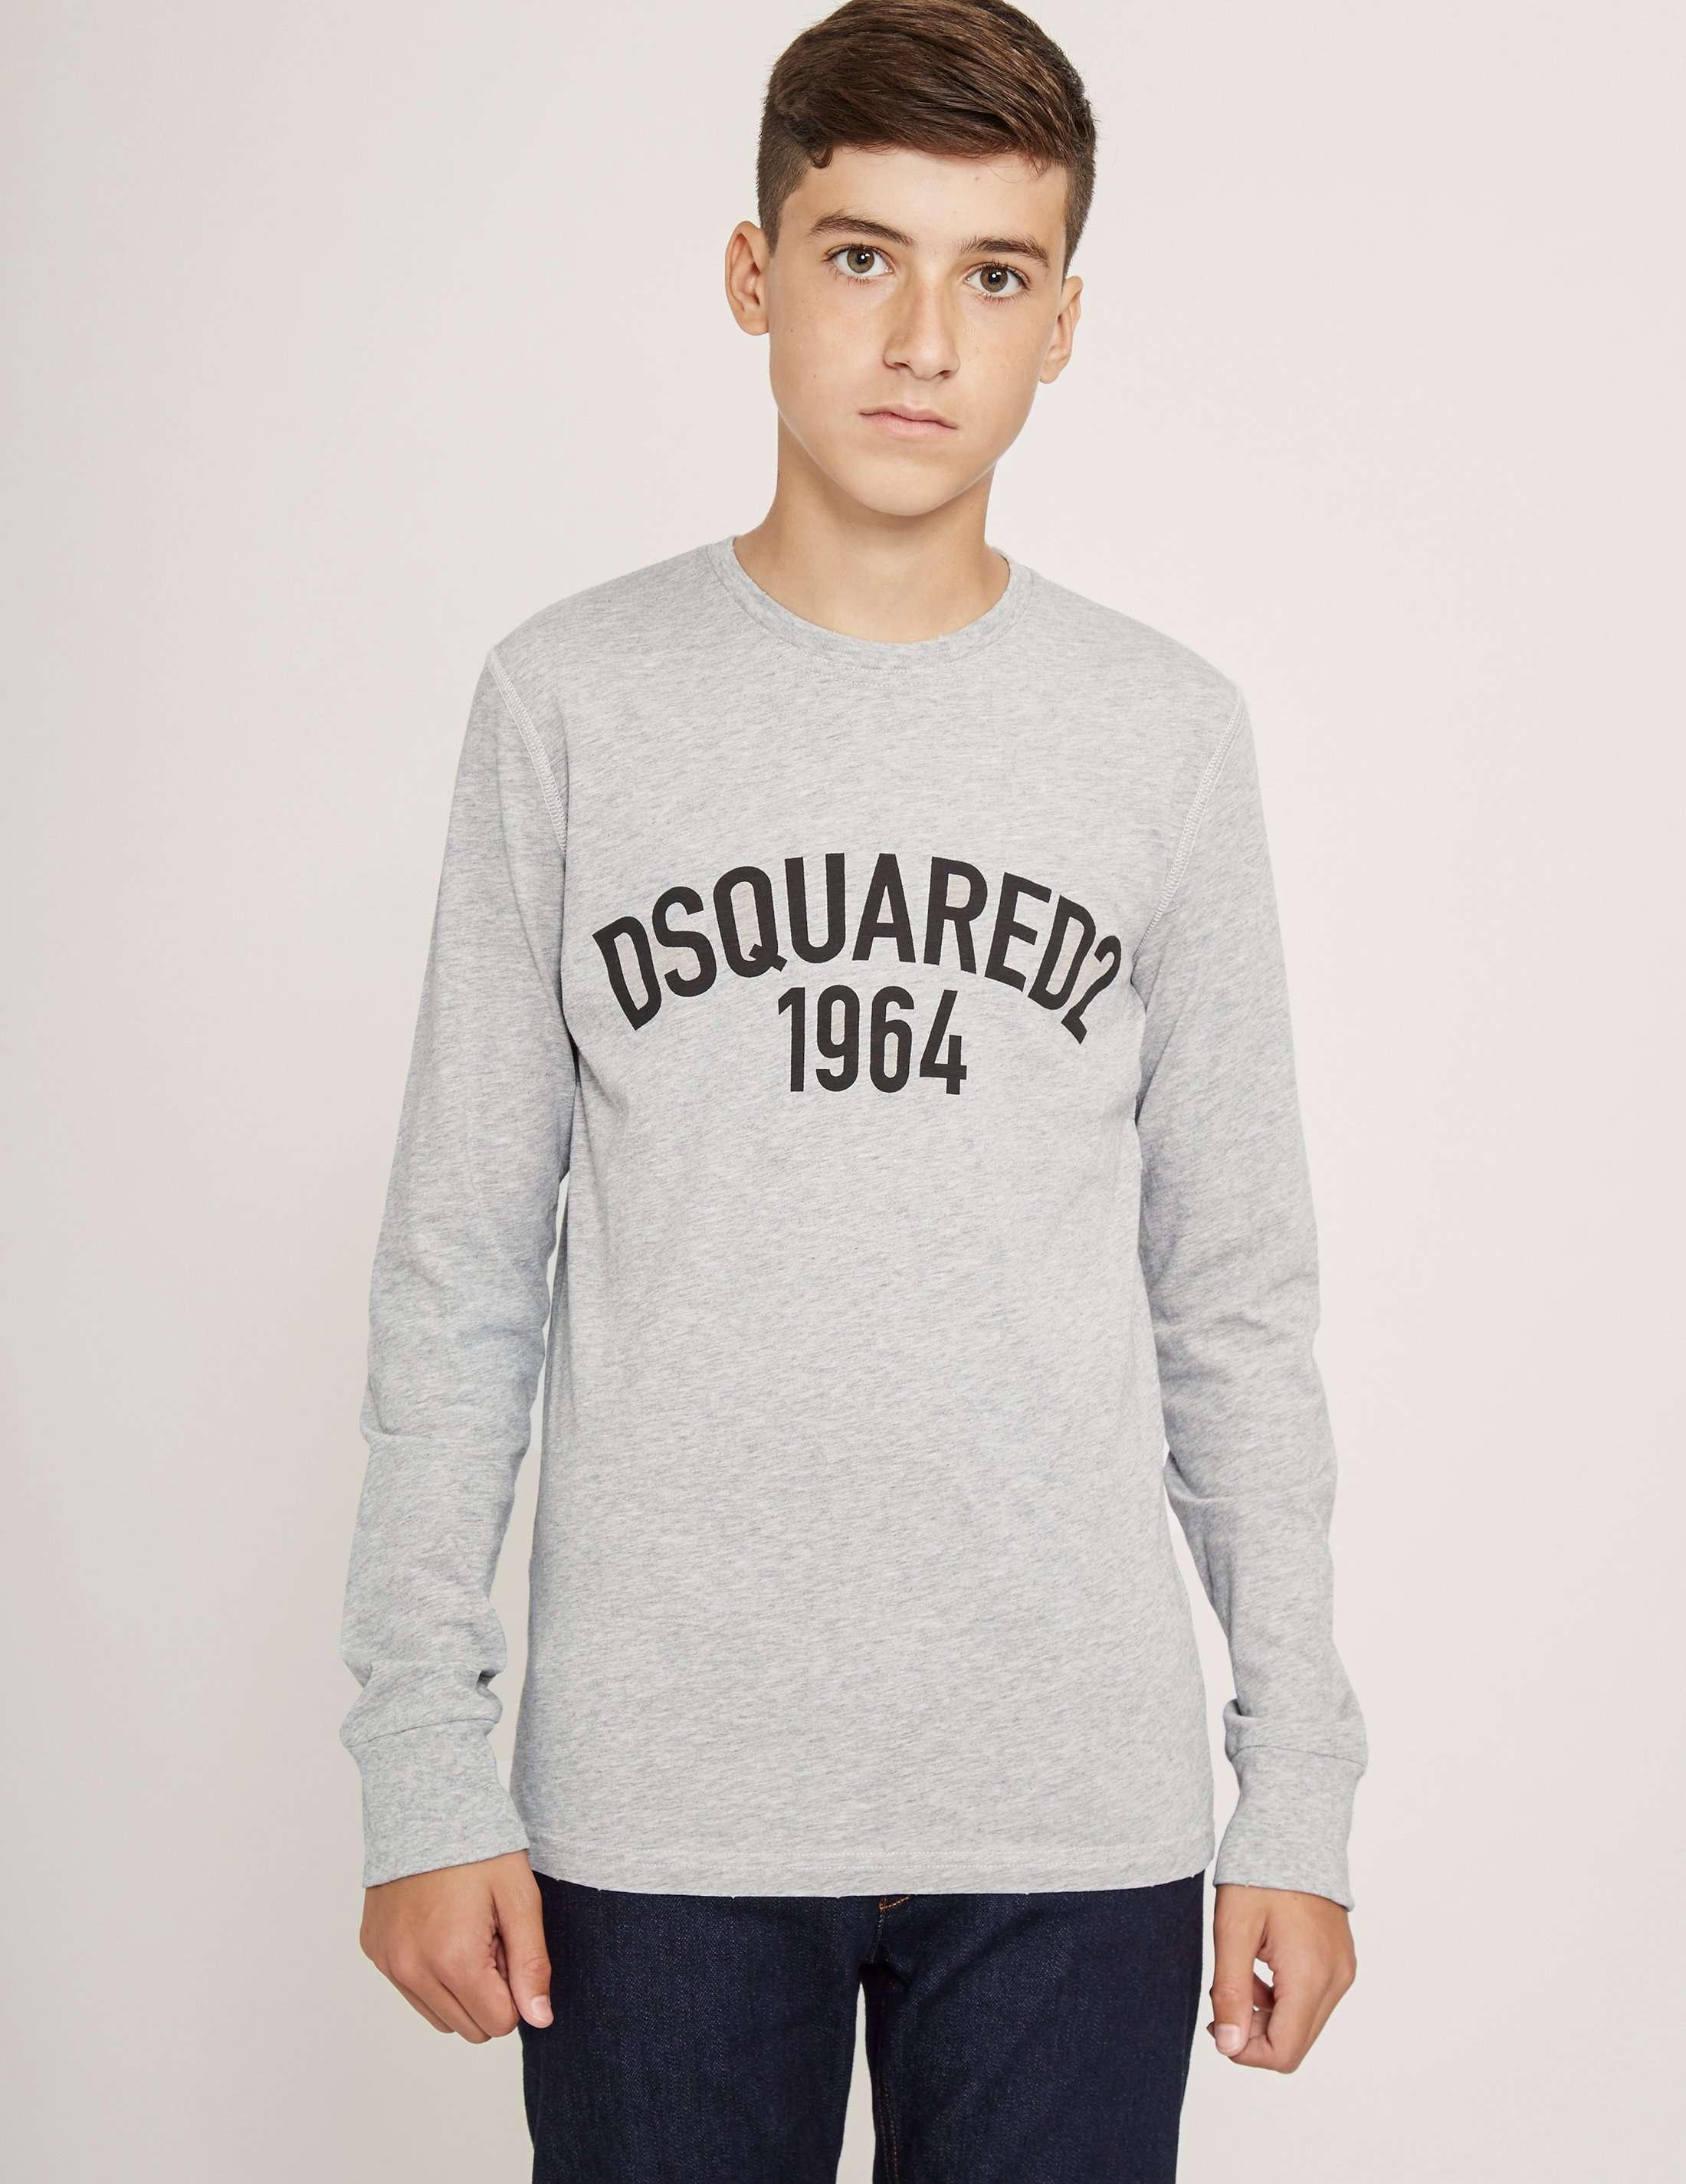 DSQUARED2 1964 Long Sleeve T-Shirt